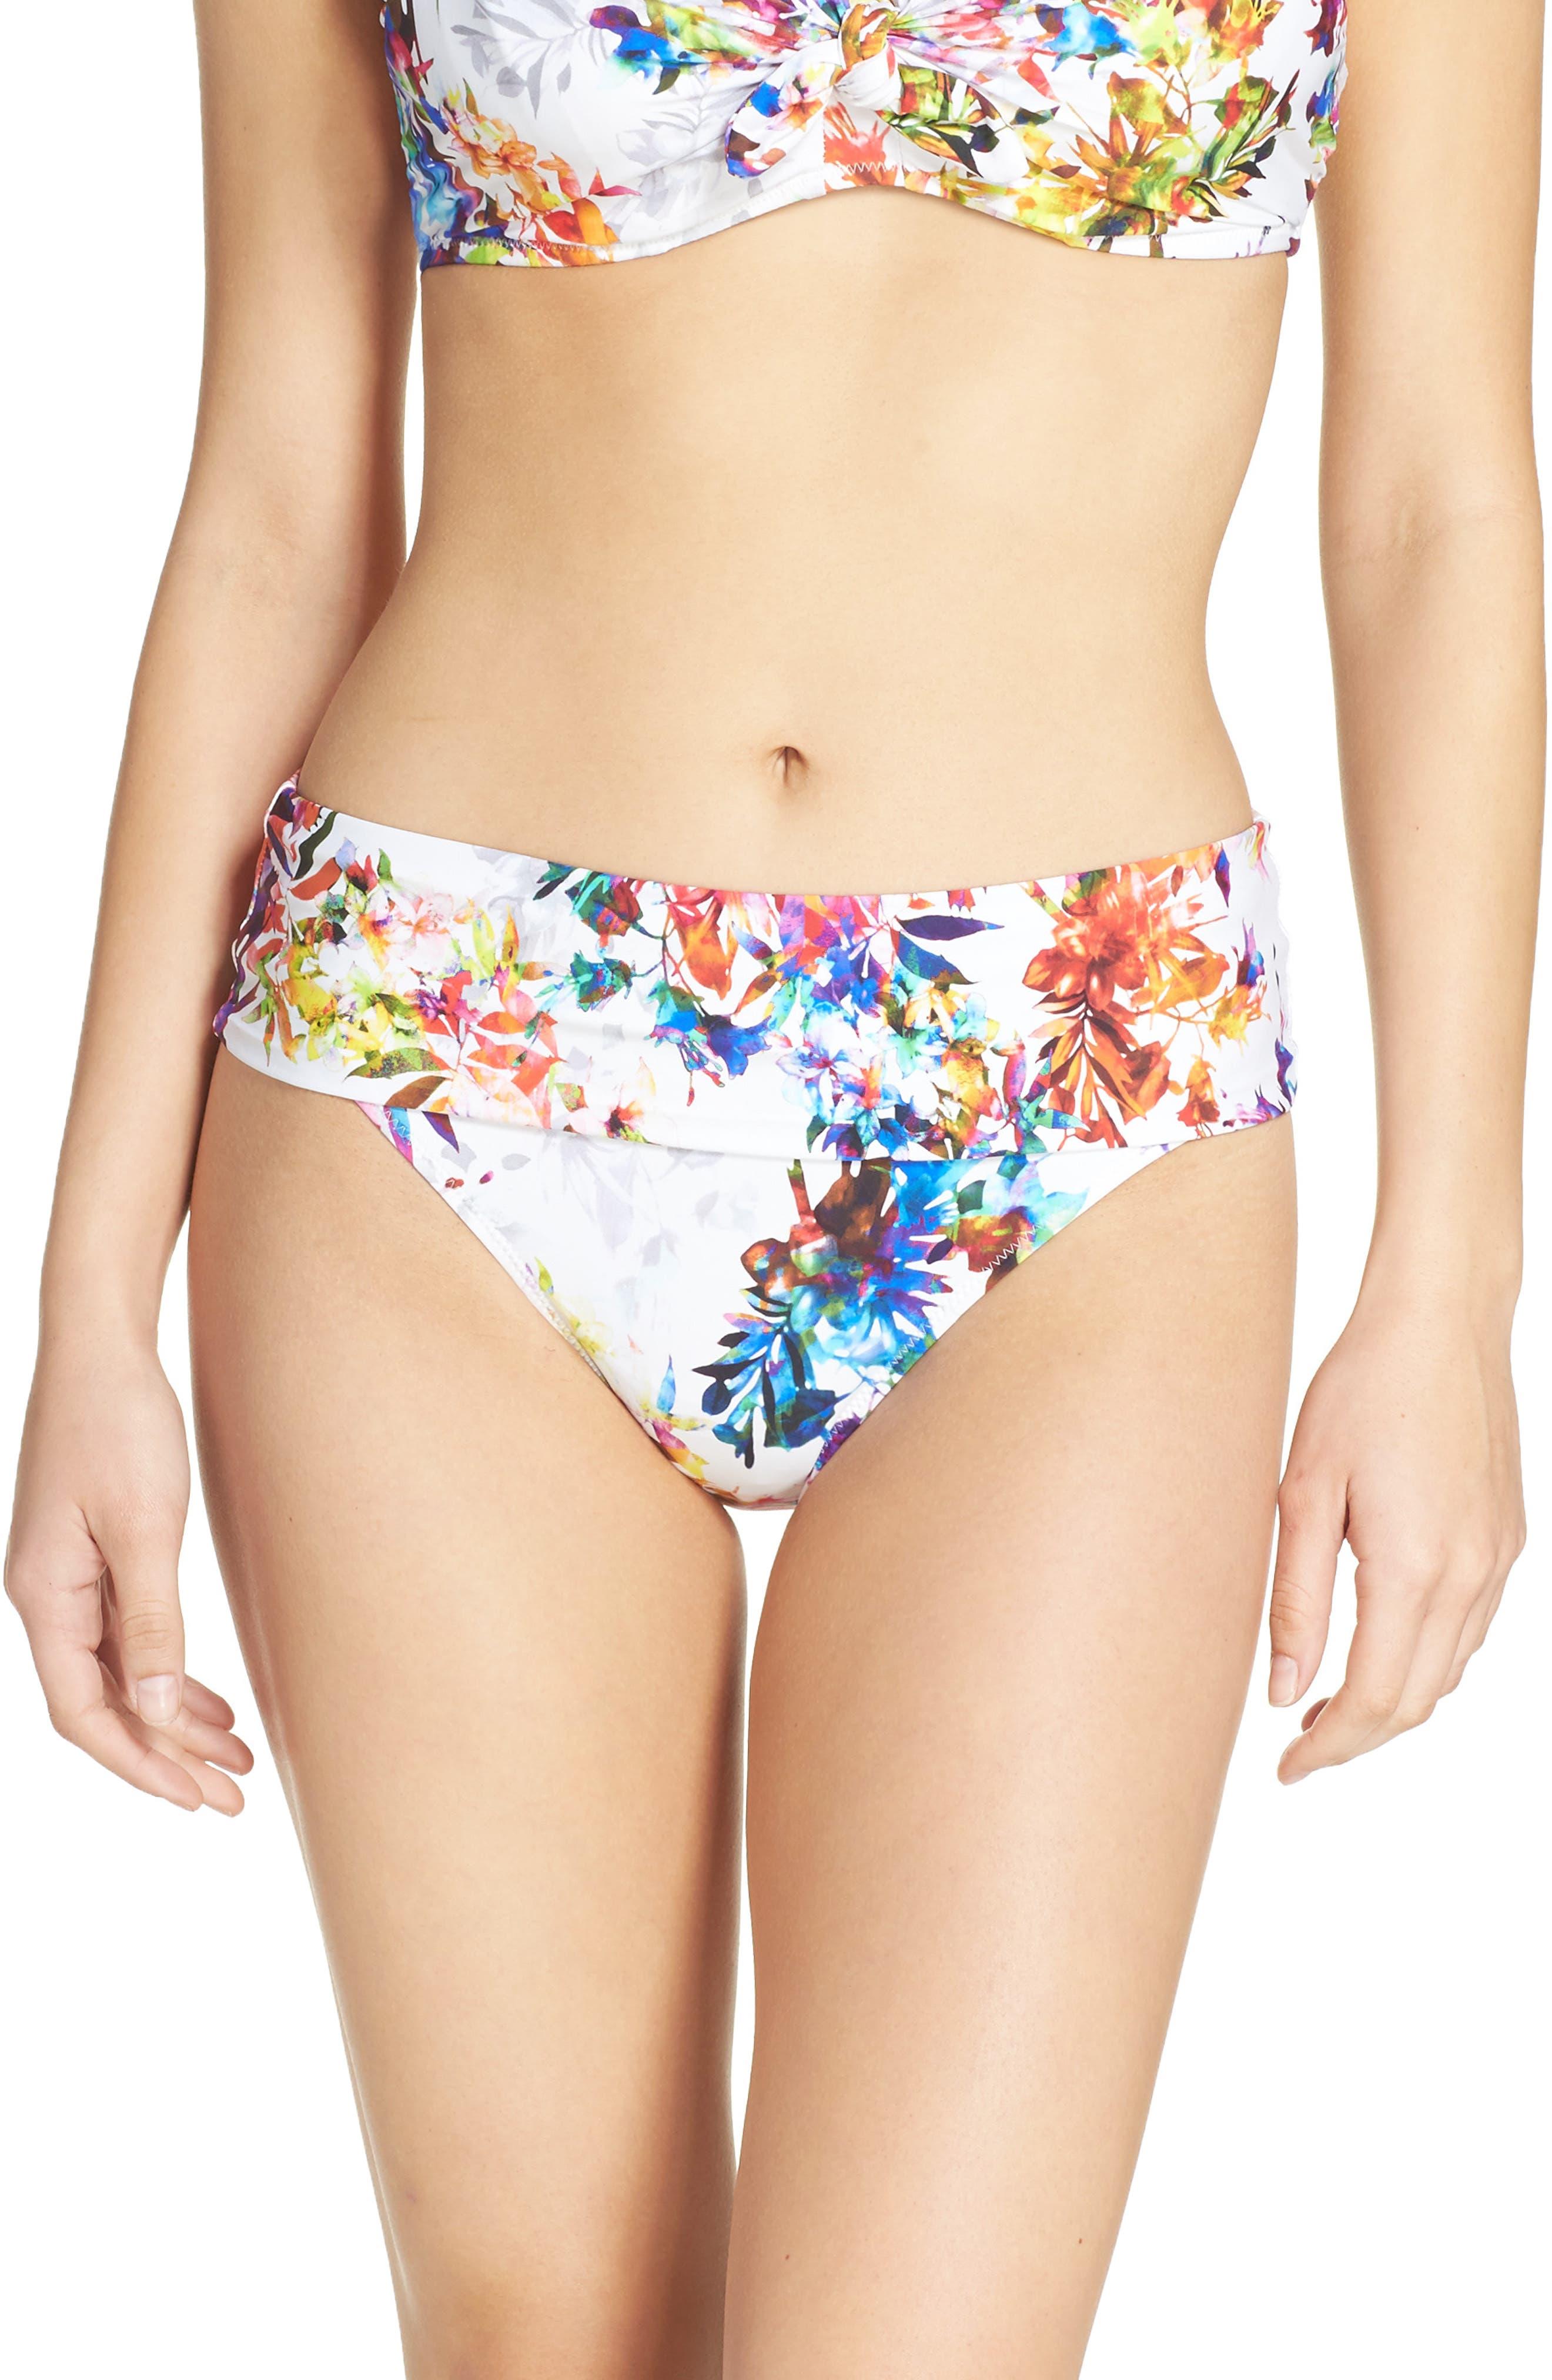 Agra Foldover Waist Bikini Bottoms,                             Main thumbnail 1, color,                             White Multi